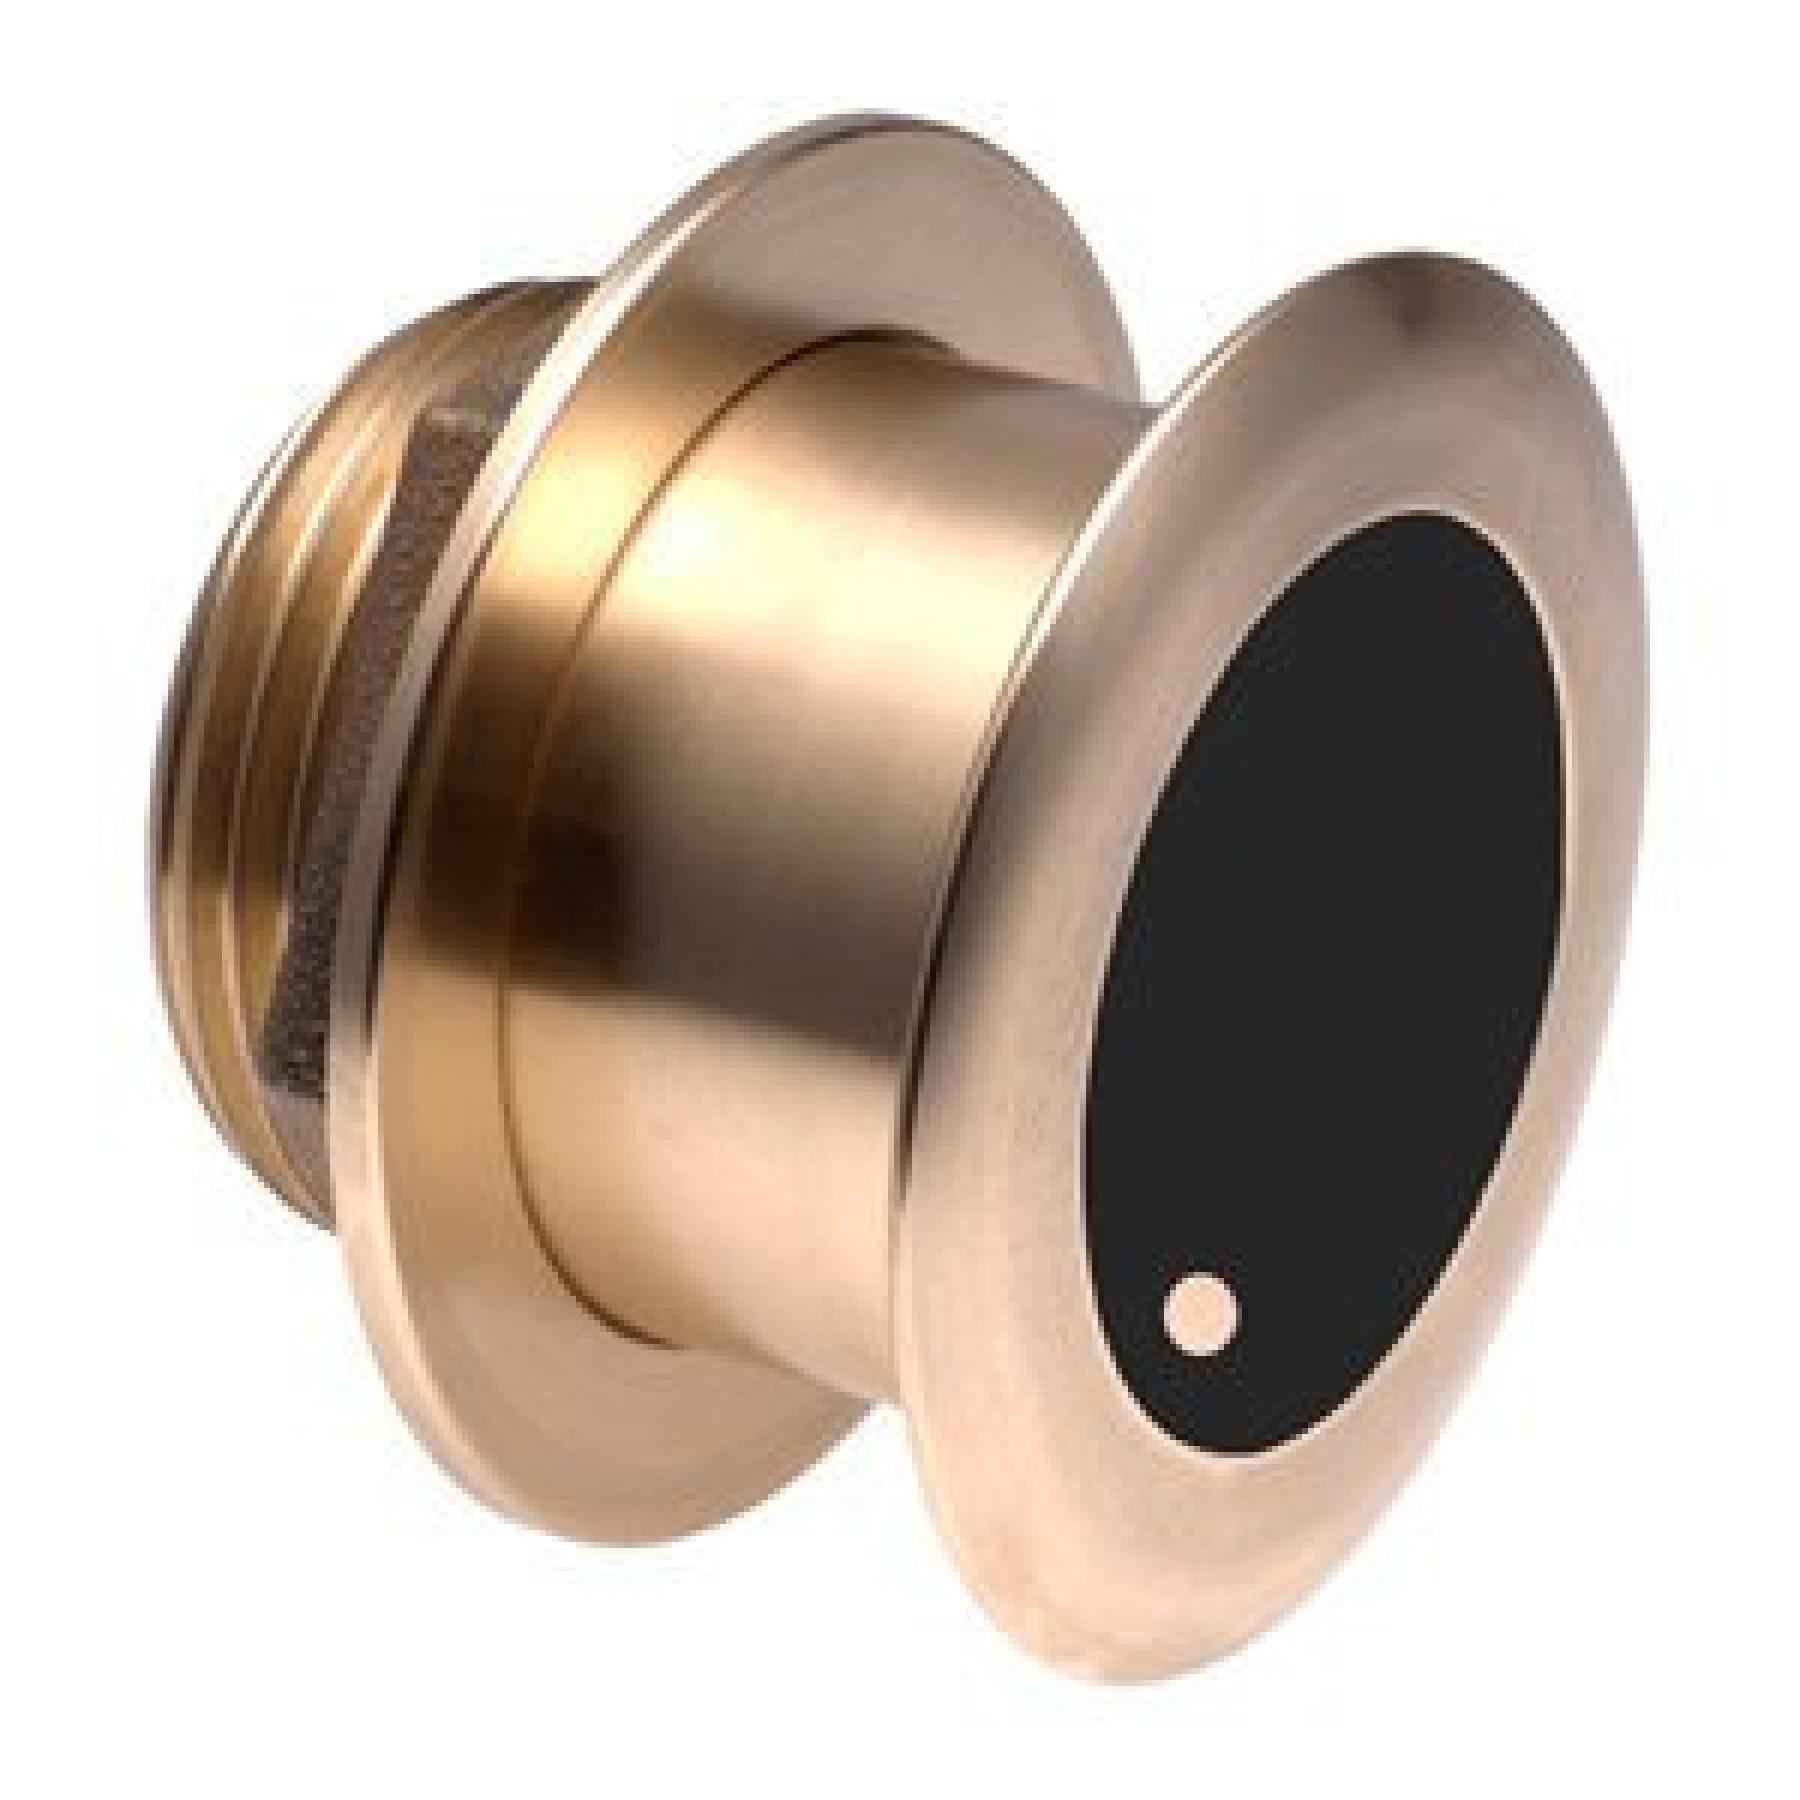 Garmin airmar b175l sensor 0° inclined element